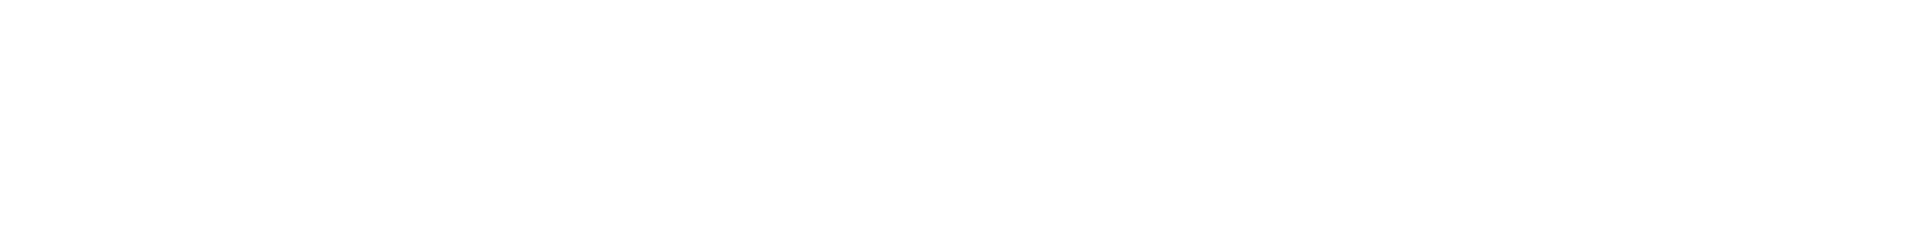 tri_white_down